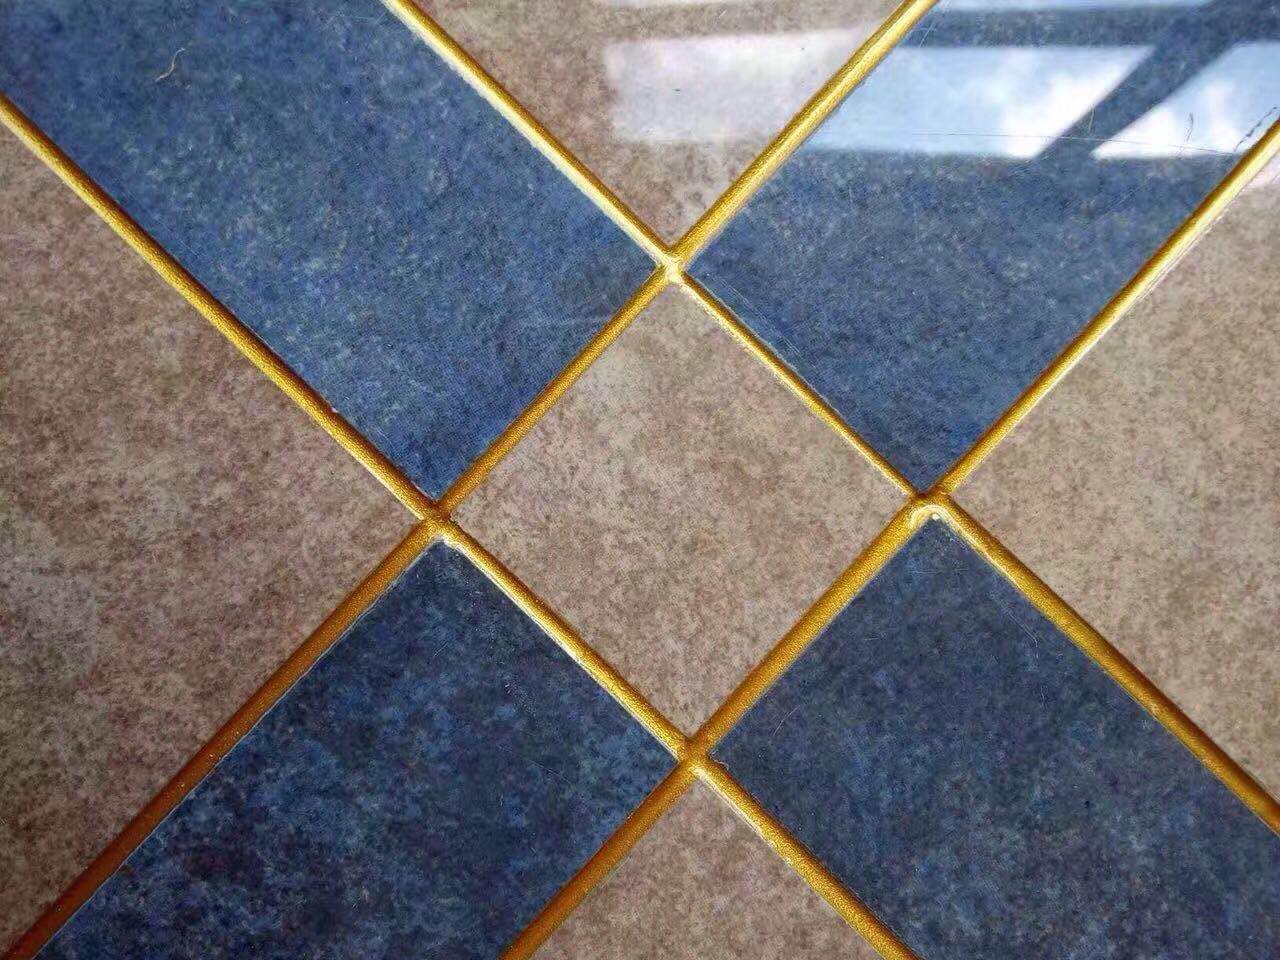 China Gitter Hardener Waterproof Ceramic Epoxy Tile Grout China